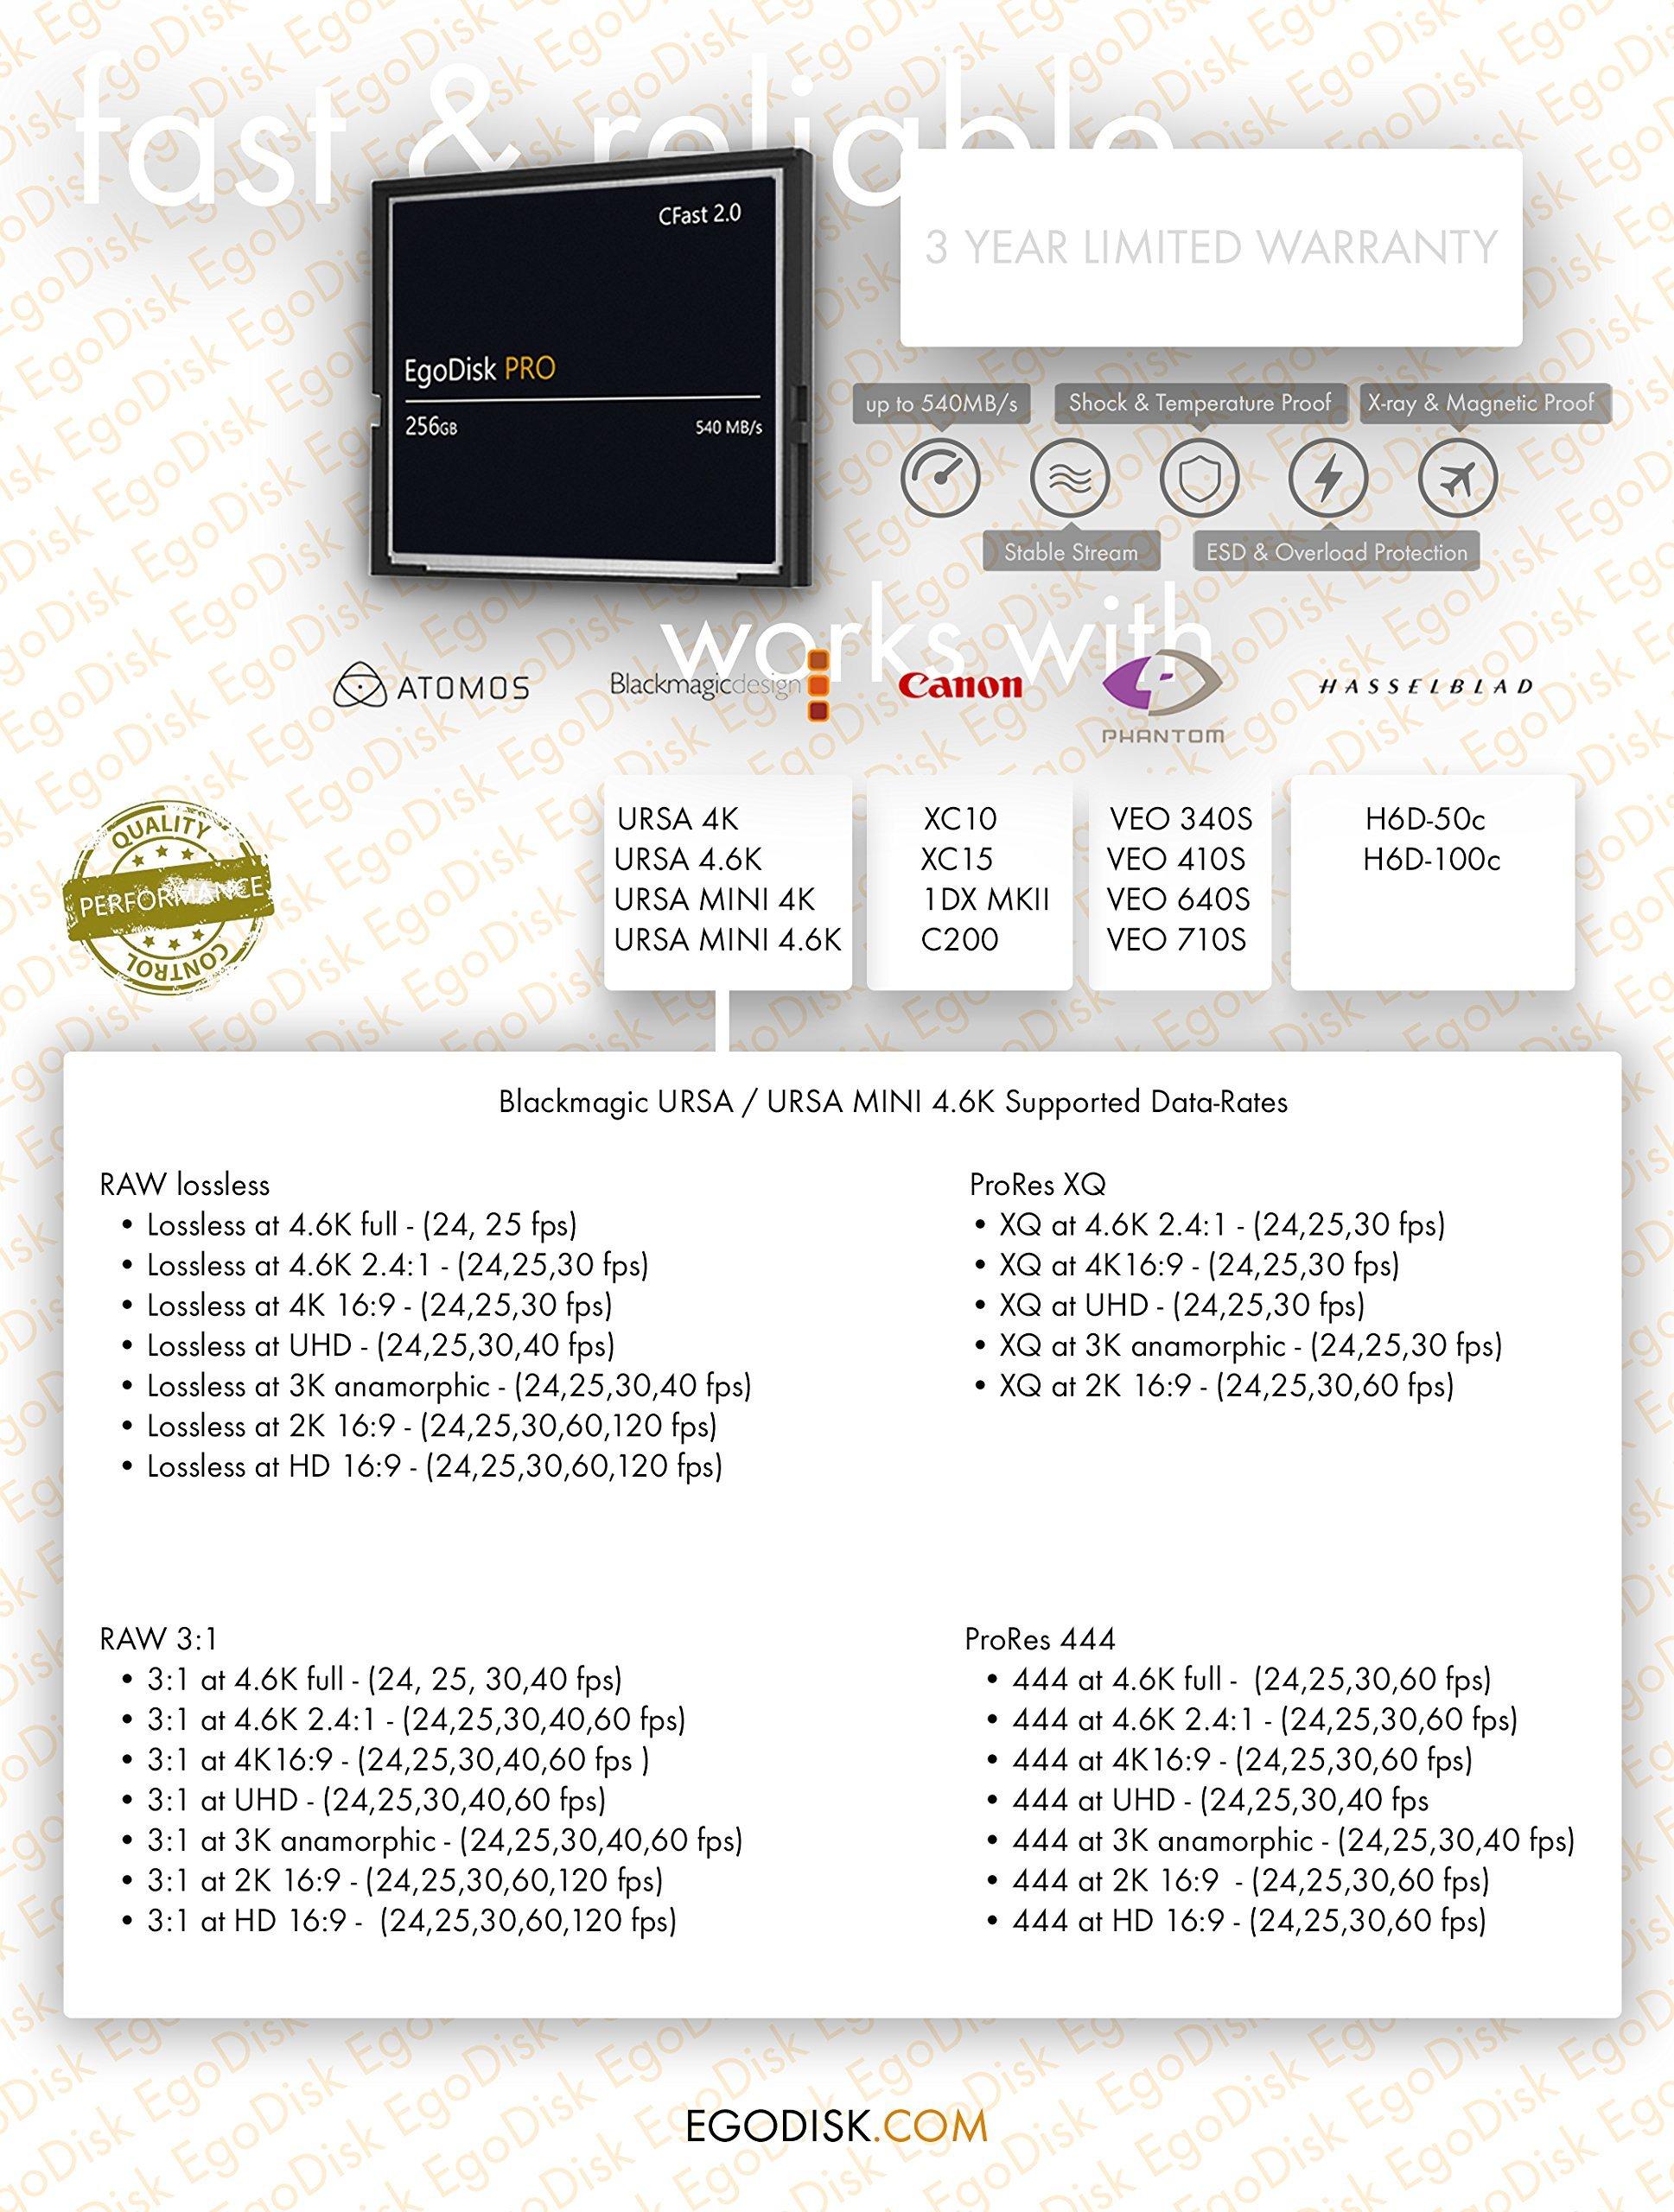 Egodisk pro 256gb cfast 2. 0 card - (blackmagic design ursa mini 4k • 4. 6k | canon • xc10 • xc15 • 1dx mark ii • c200 | hasselblad h6d-50c • h6d-100c | atomos | phantom veo s) - 3 year warranty 2 egodisk. Com 3 year usa limited warranty global shipping video performance guarantee-230 ( vpg-230 ) cfast 2. 0 vpg-230 capacity: 256gb speed: 565mb/s